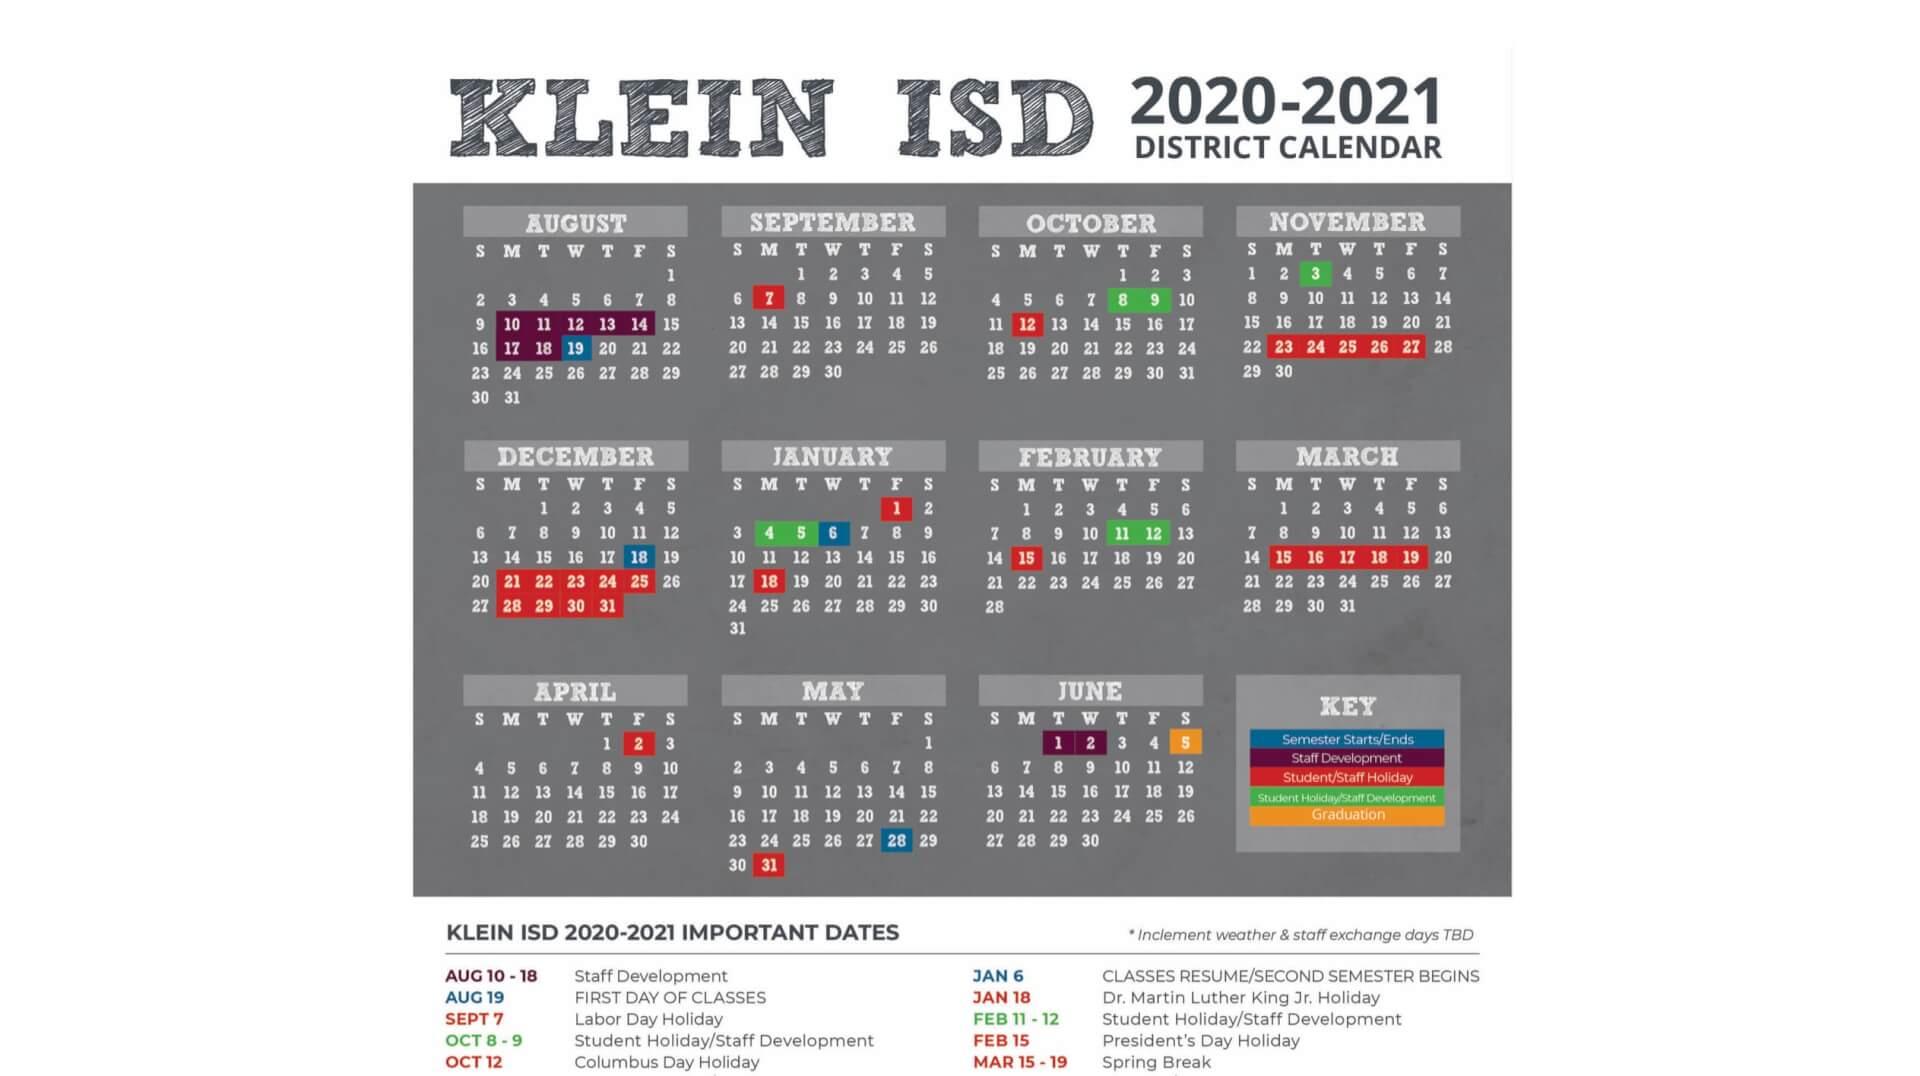 Killeen Isd Calendar 2021 22 | 2021 Calendar For L Victorville School Distict Canlendar 2020 2021 For What Schools